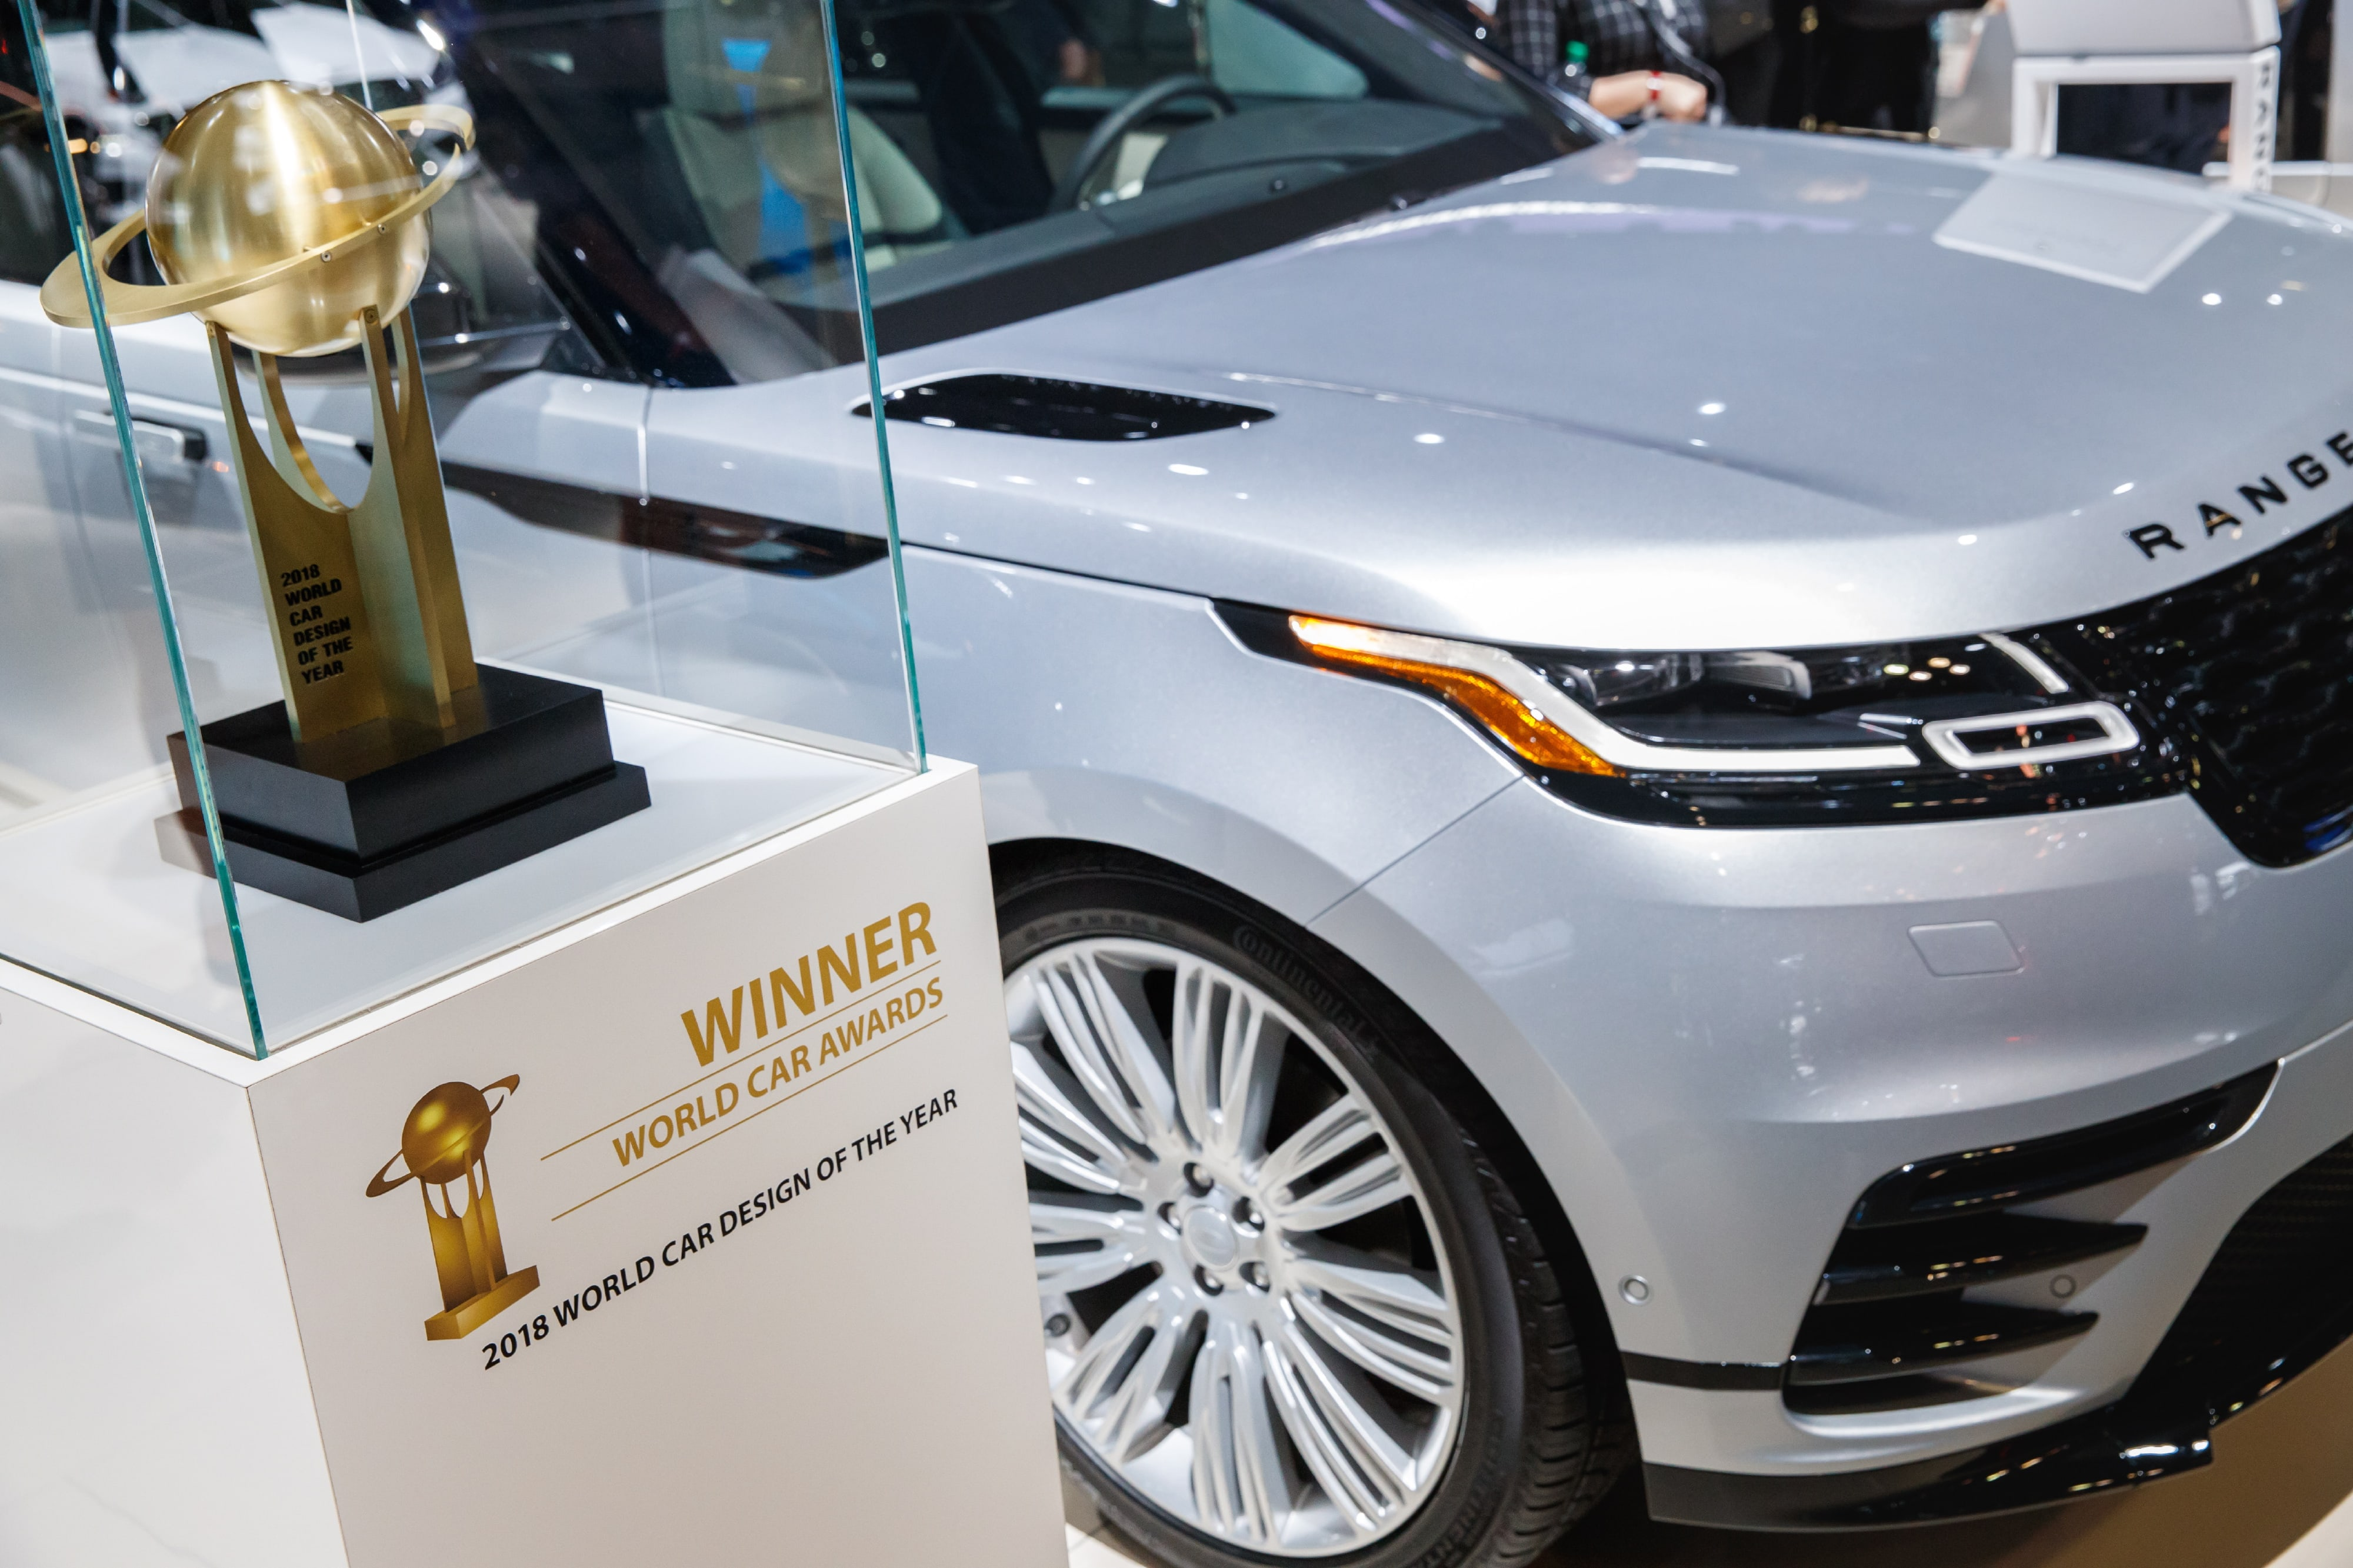 Range Rover Velar E Eleito O Carro Mais Bonito Do Mundo Carro Moto E Cia